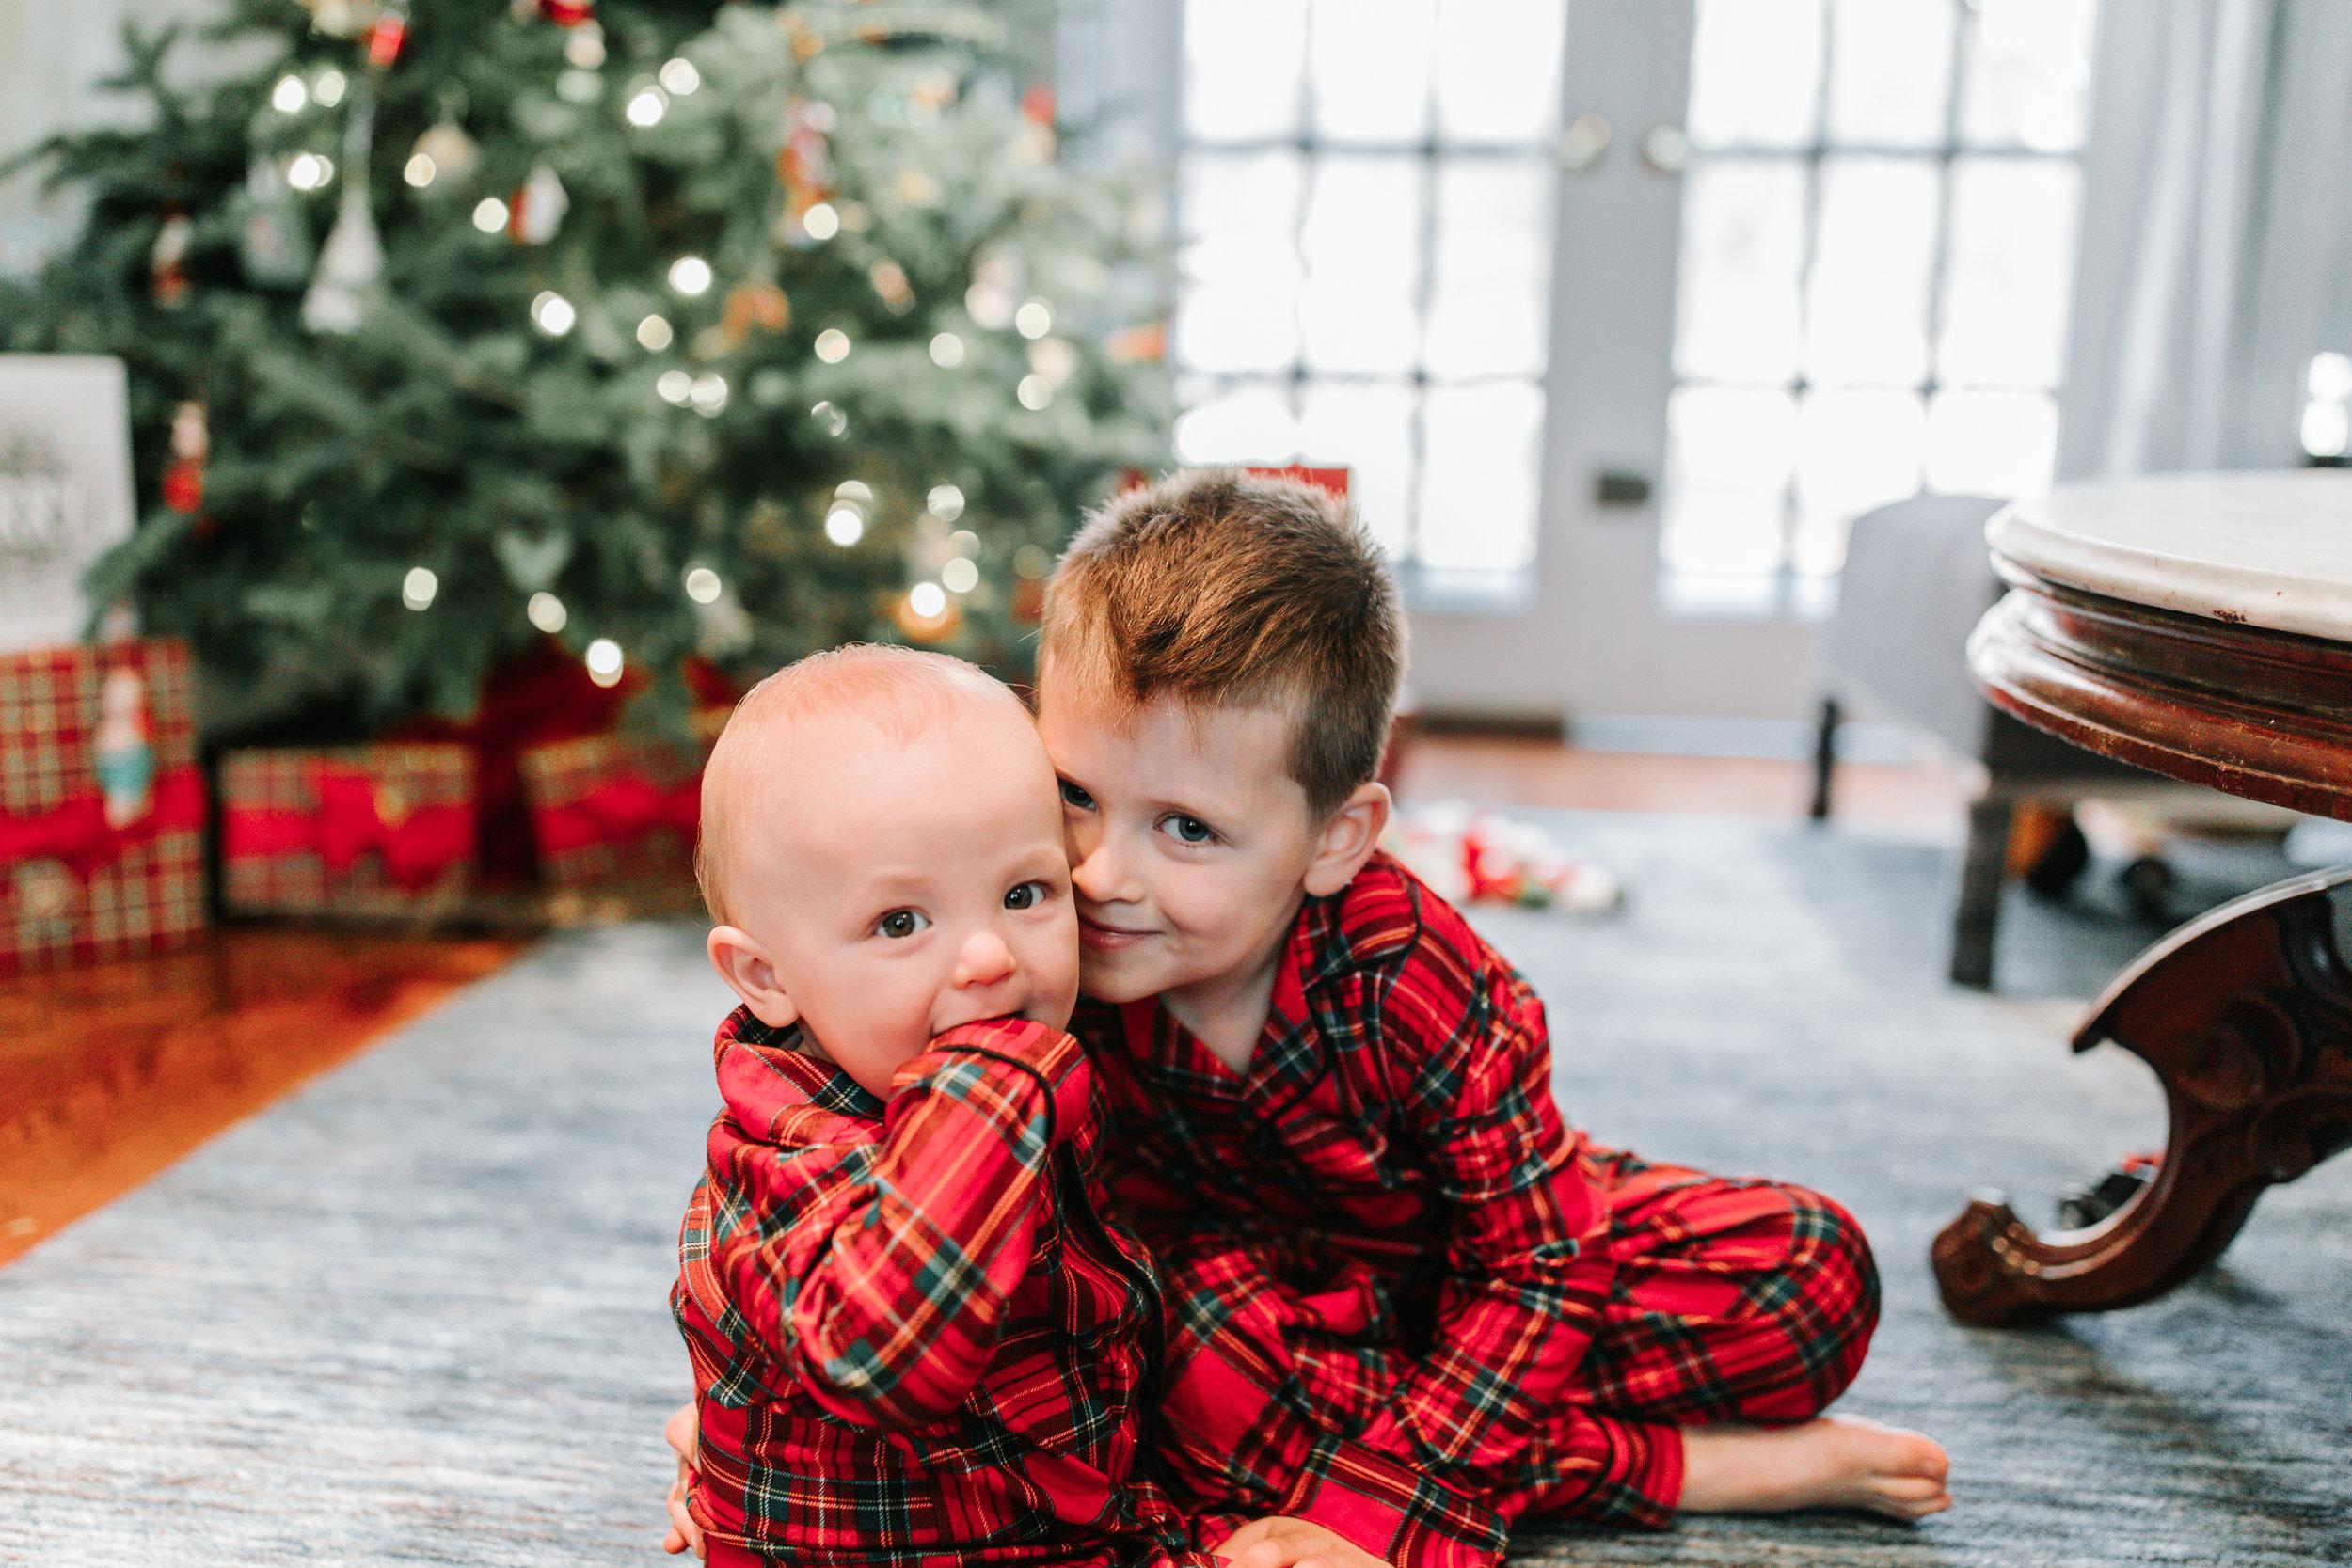 Knudsen Family Lifestyle Christmas Photos Gingerbread house 2017-2.jpg